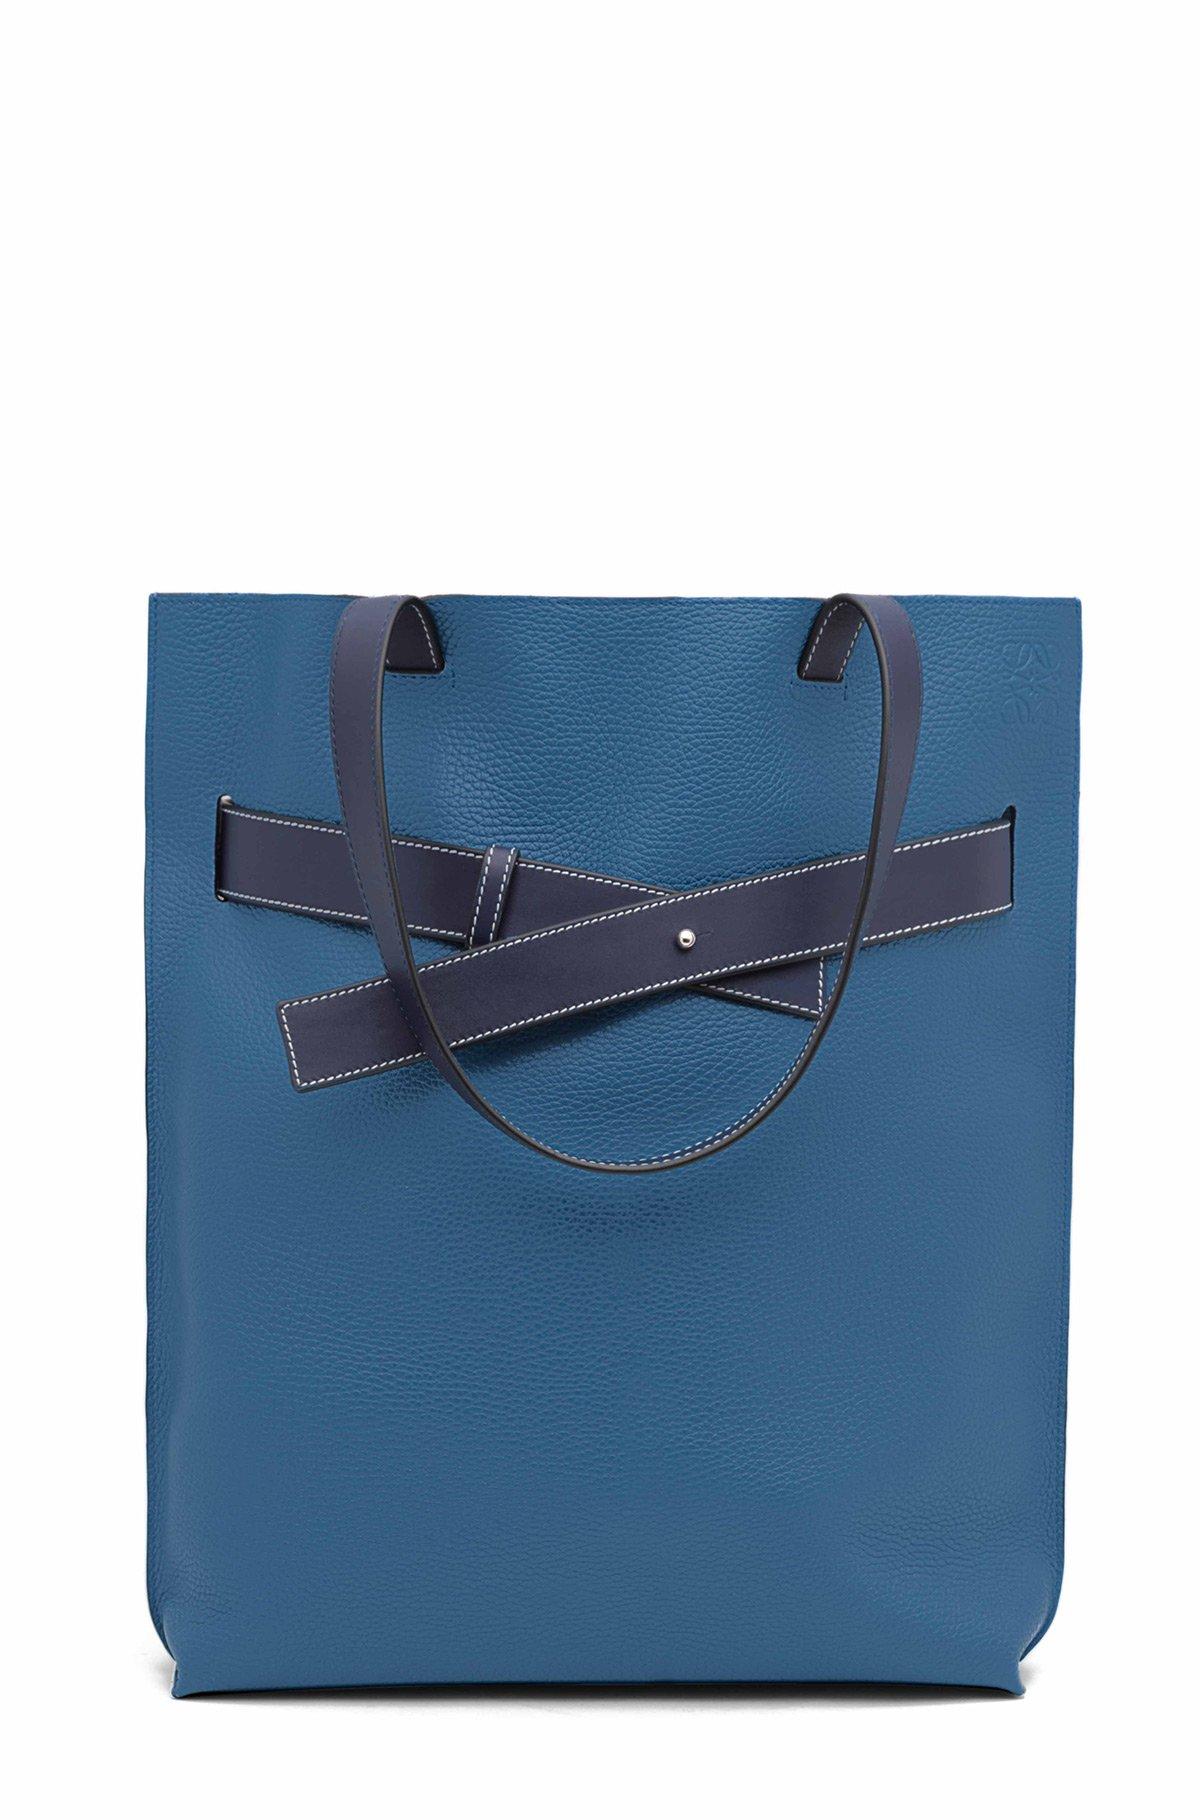 LOEWE Strap Vertical Tote Bag Duke Blue/Marine front